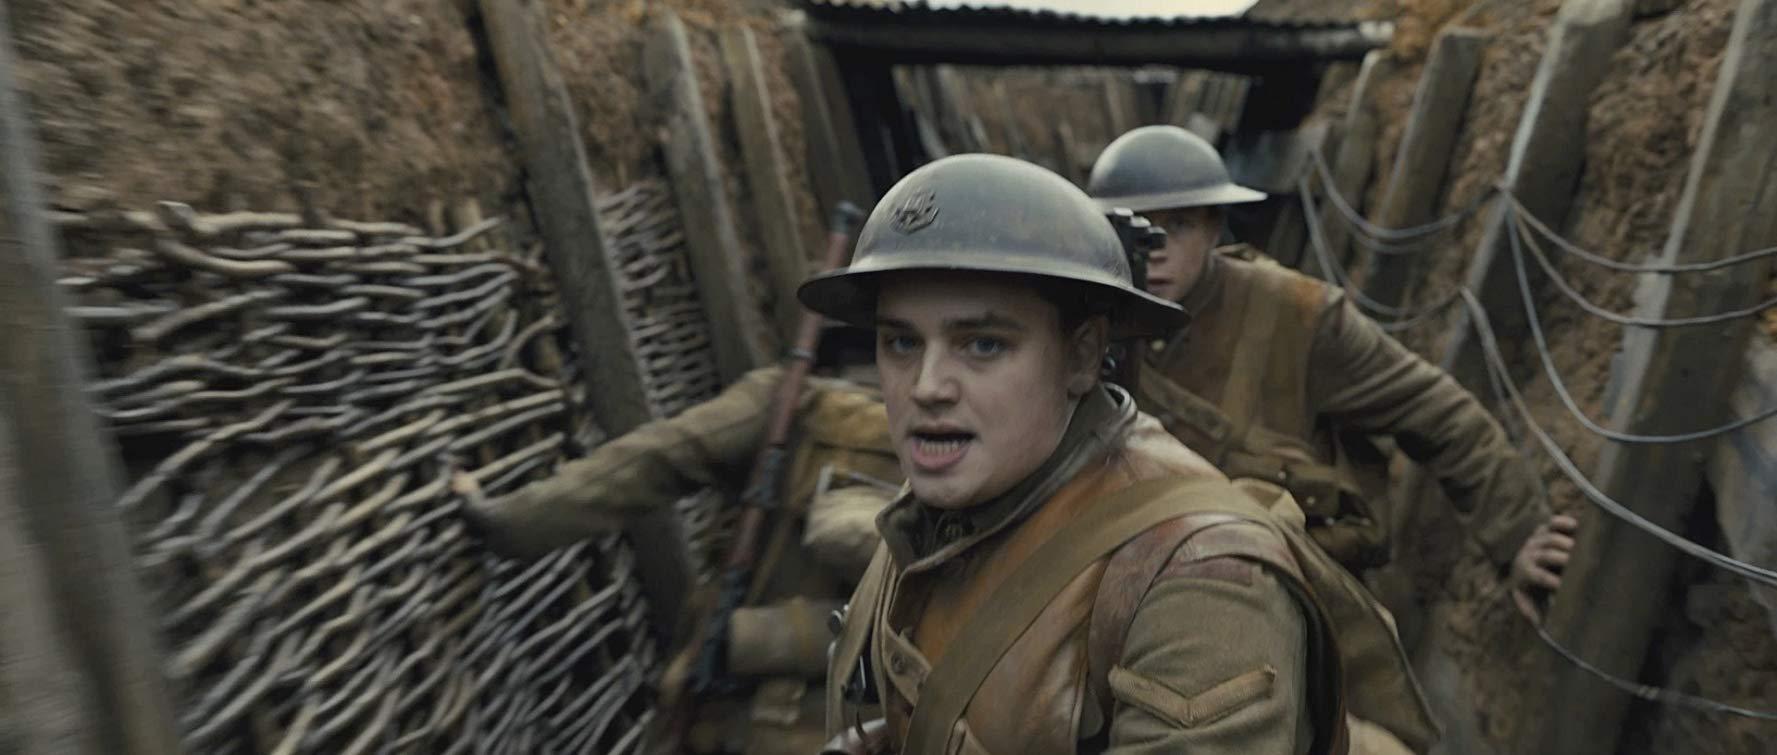 kadr z filmu 1917 Sama Mendesa